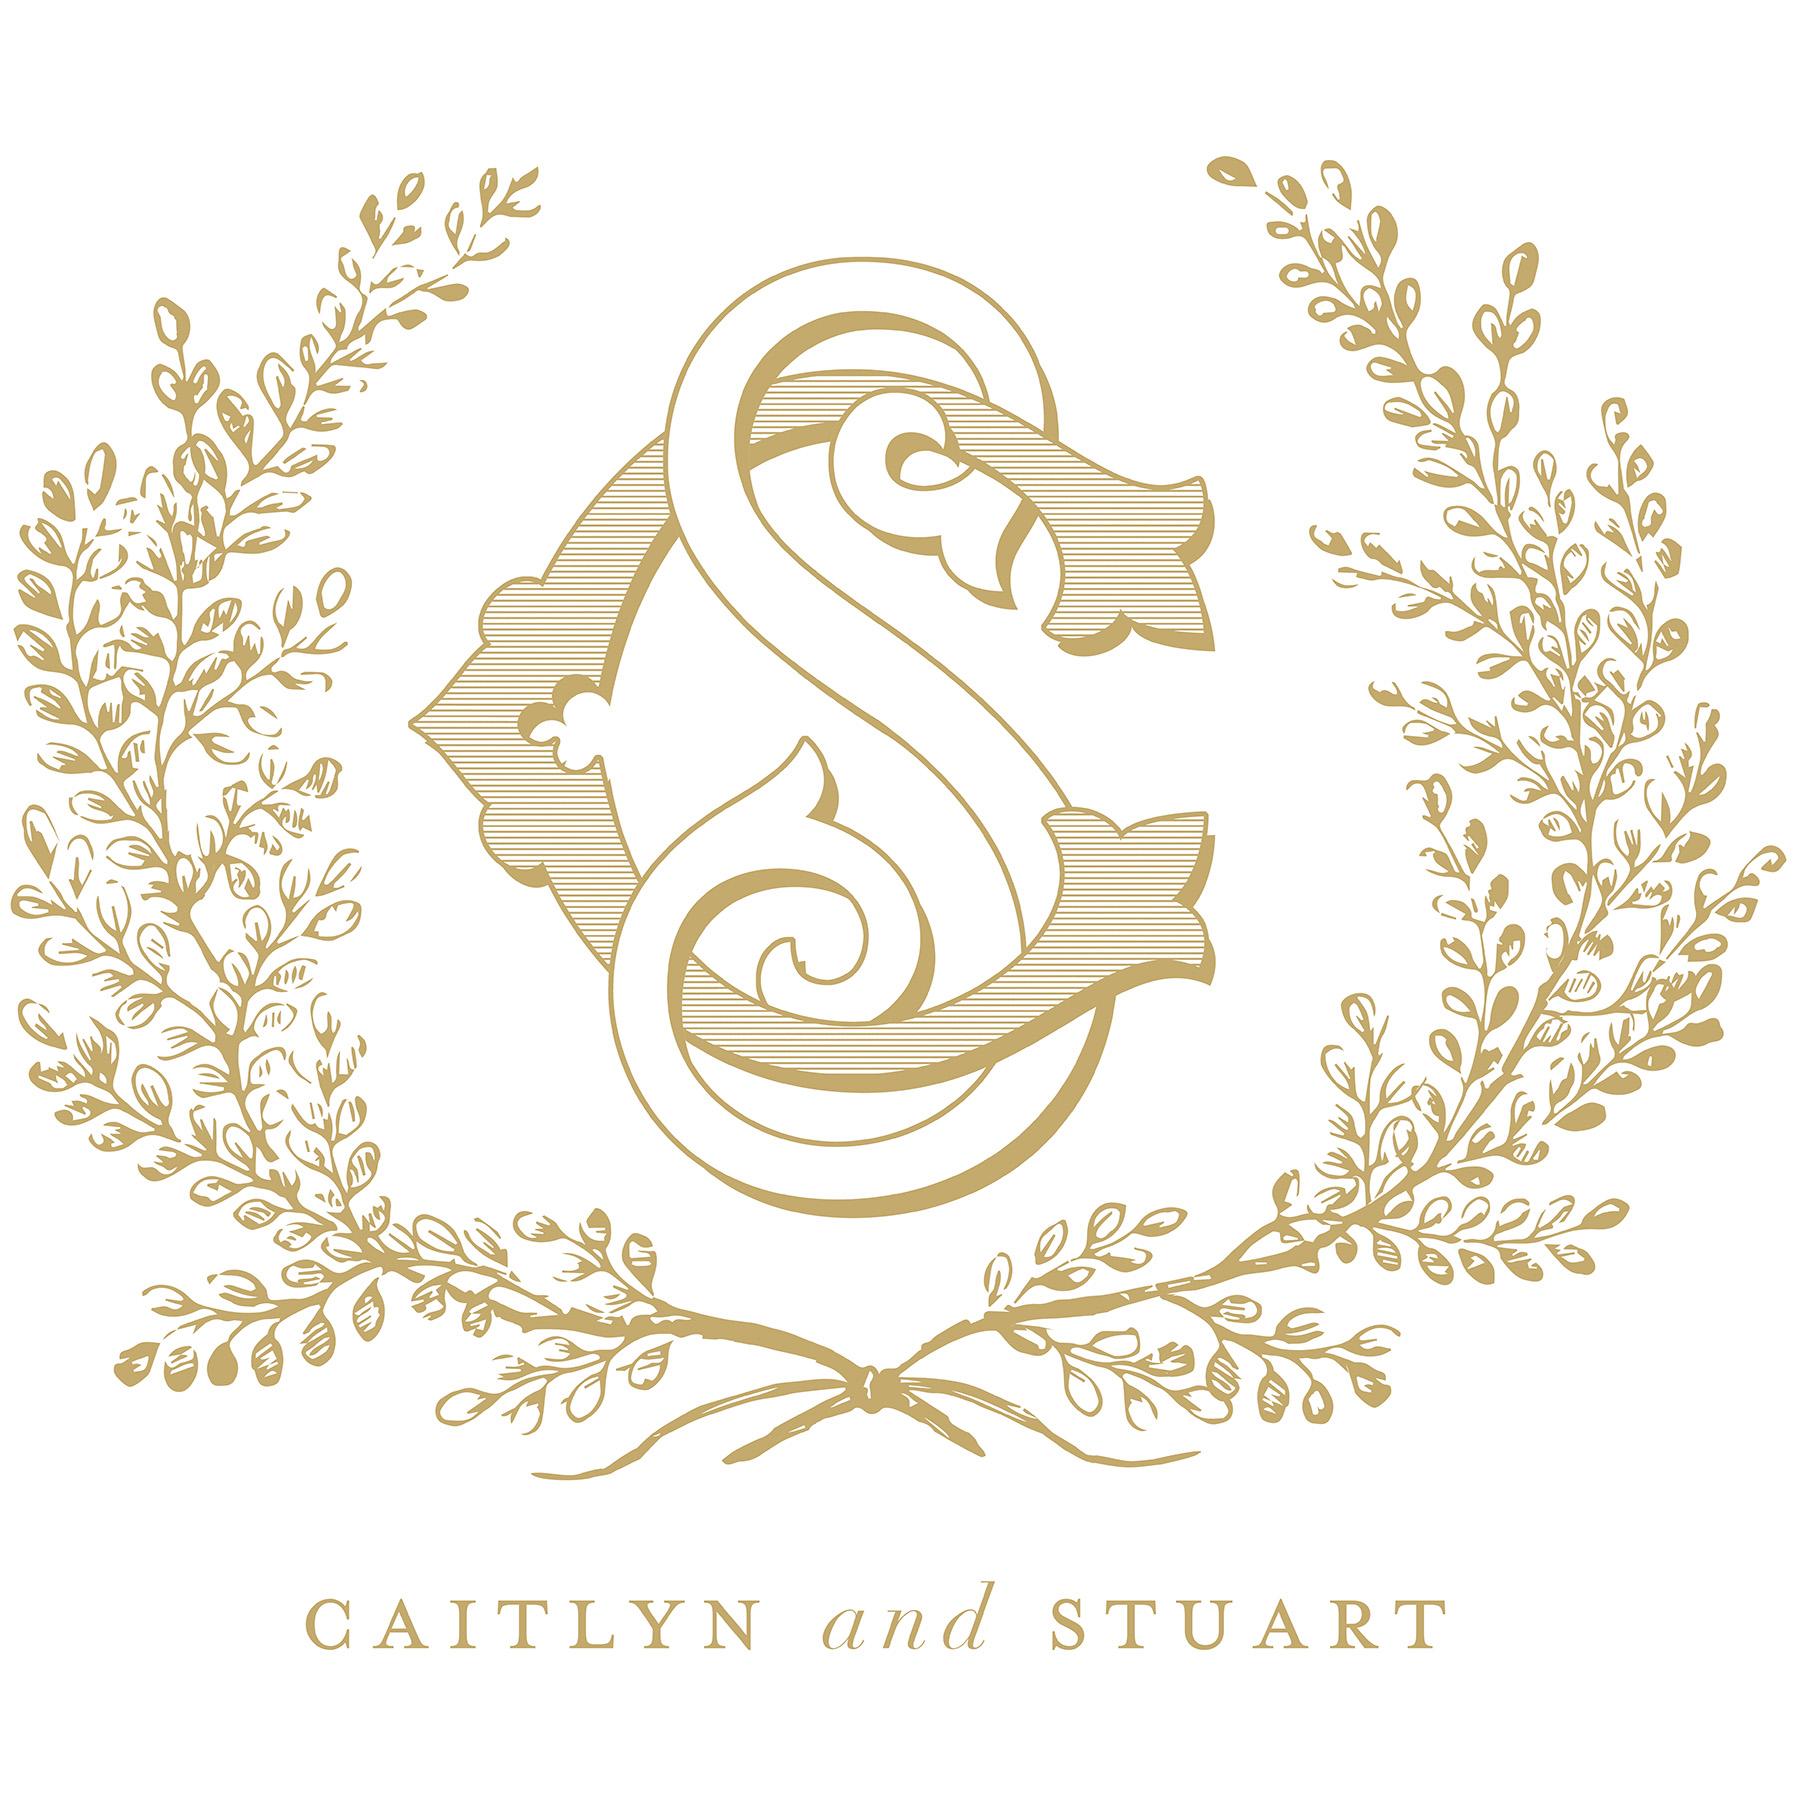 Caitlyn - Monogram (small).jpg